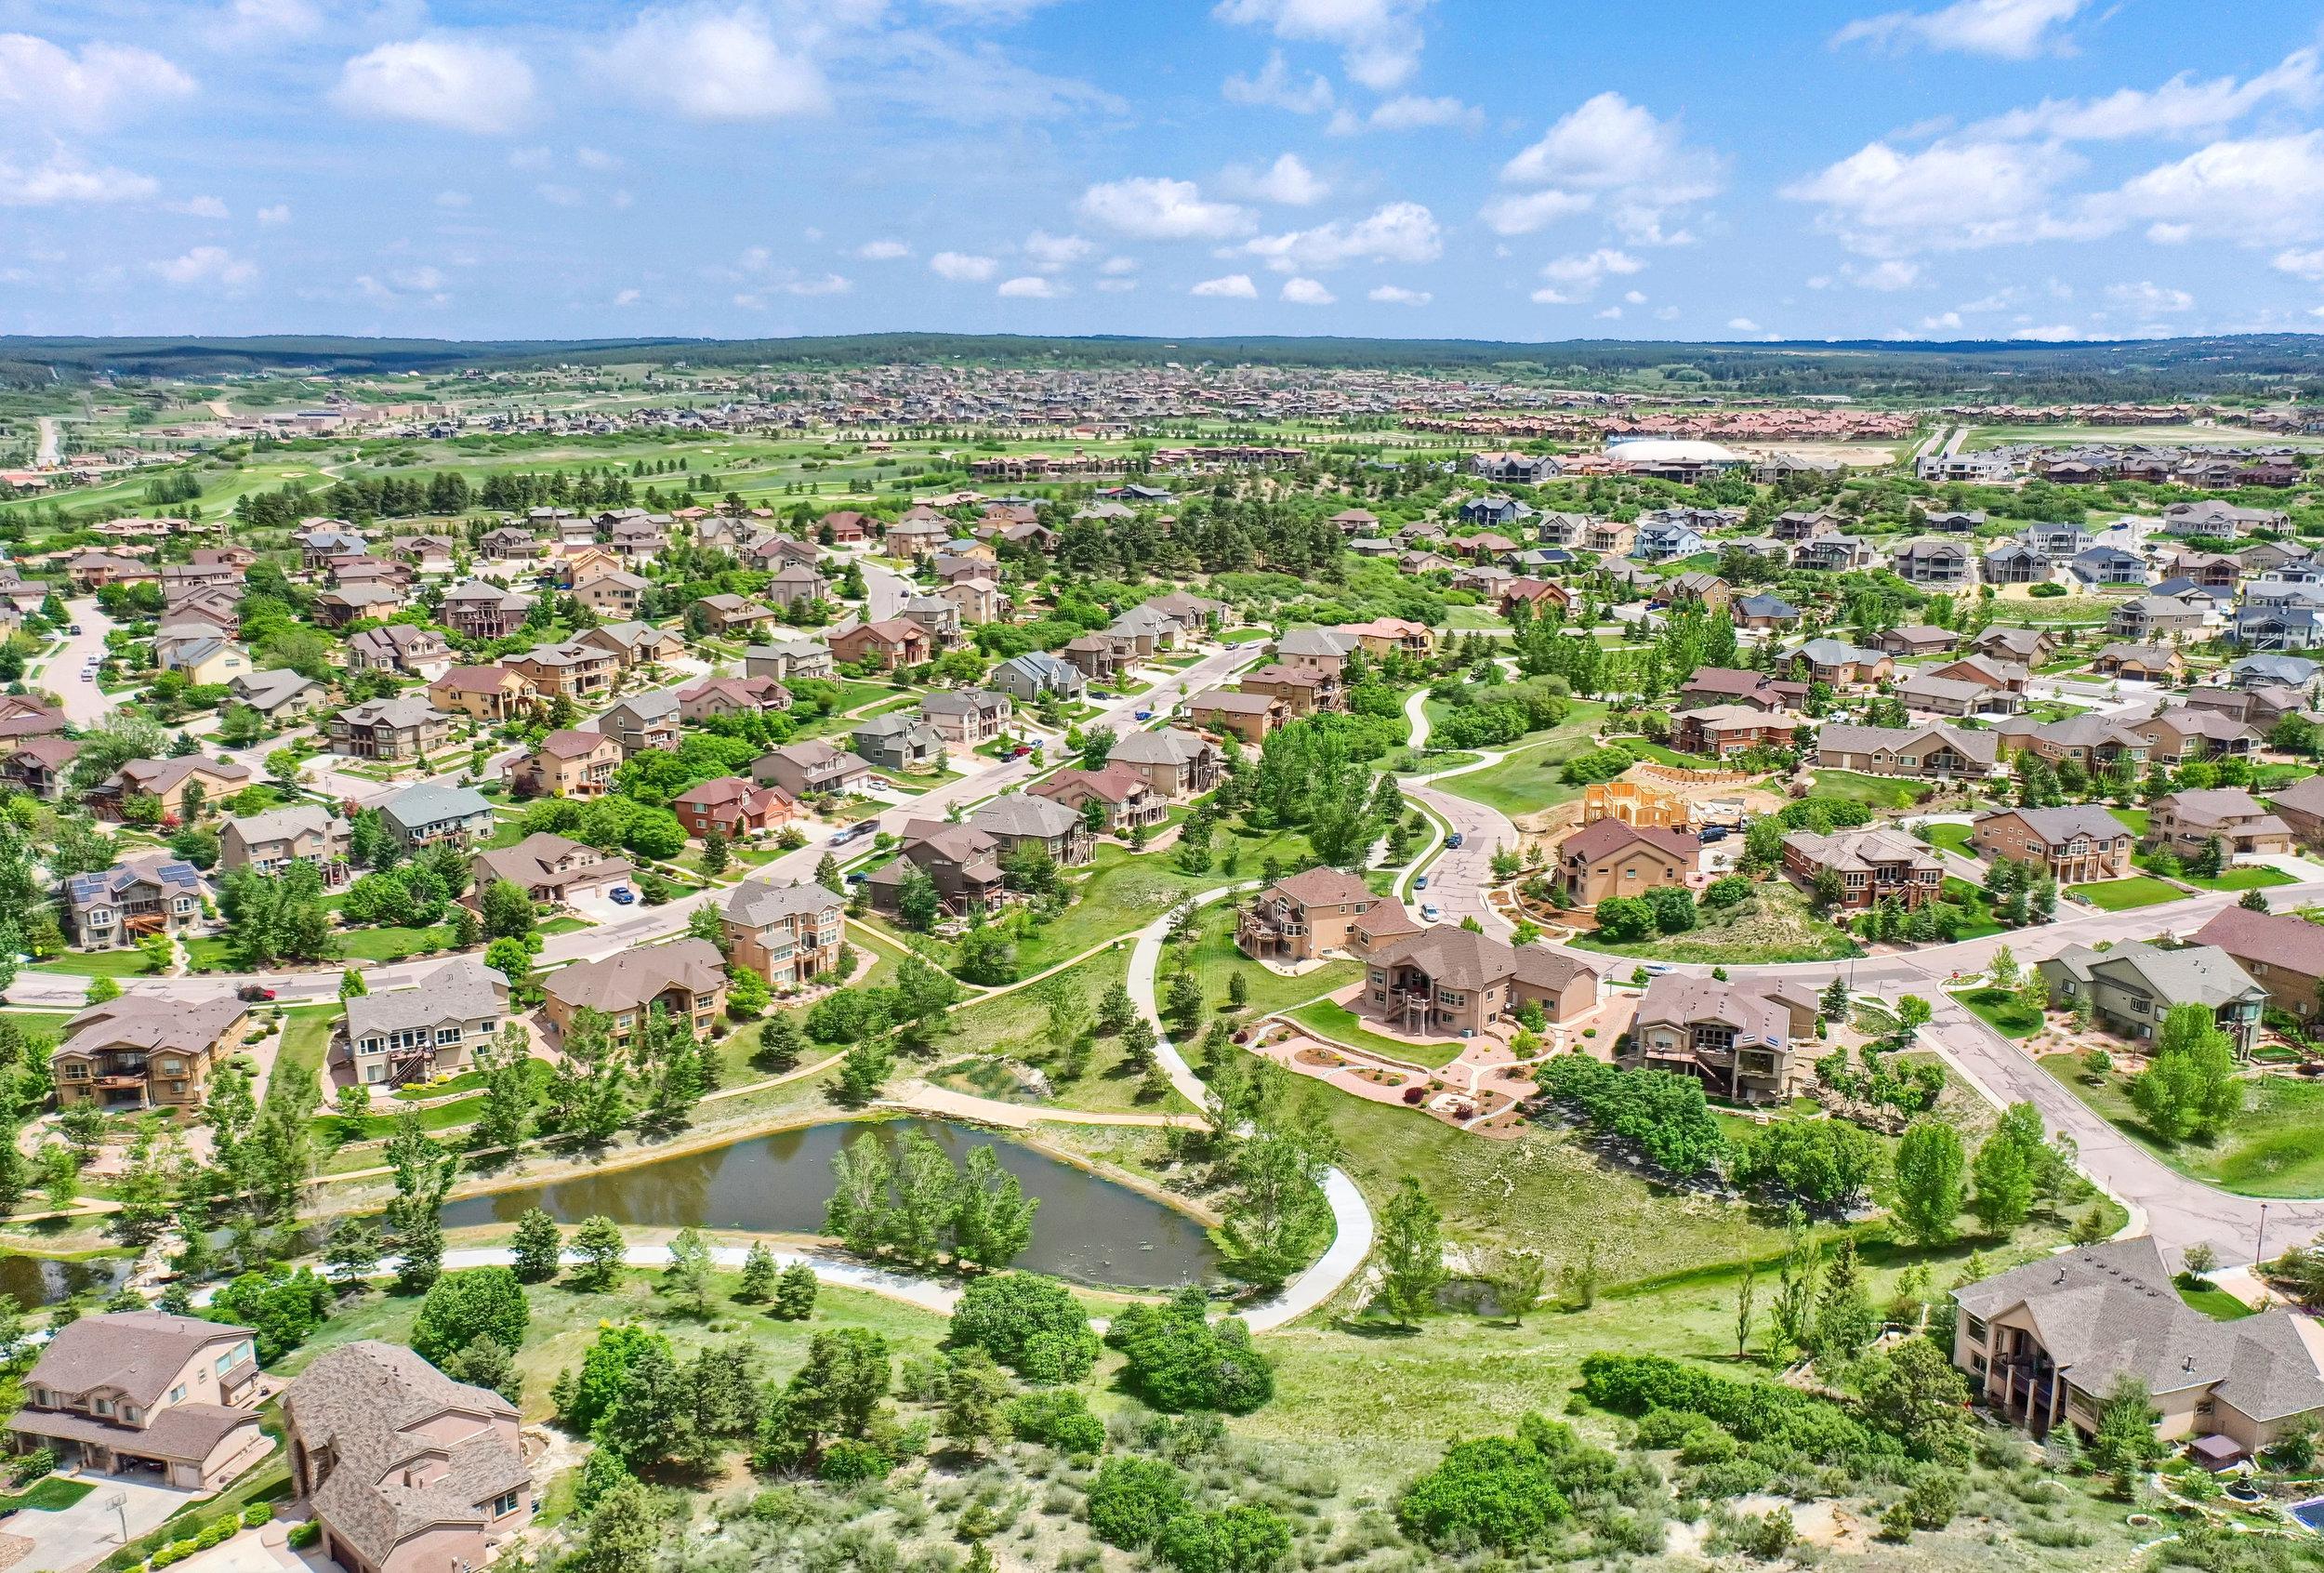 12496 Creekhurst Dr Colorado-print-017-055-Aerial-4200x2843-300dpi.jpg